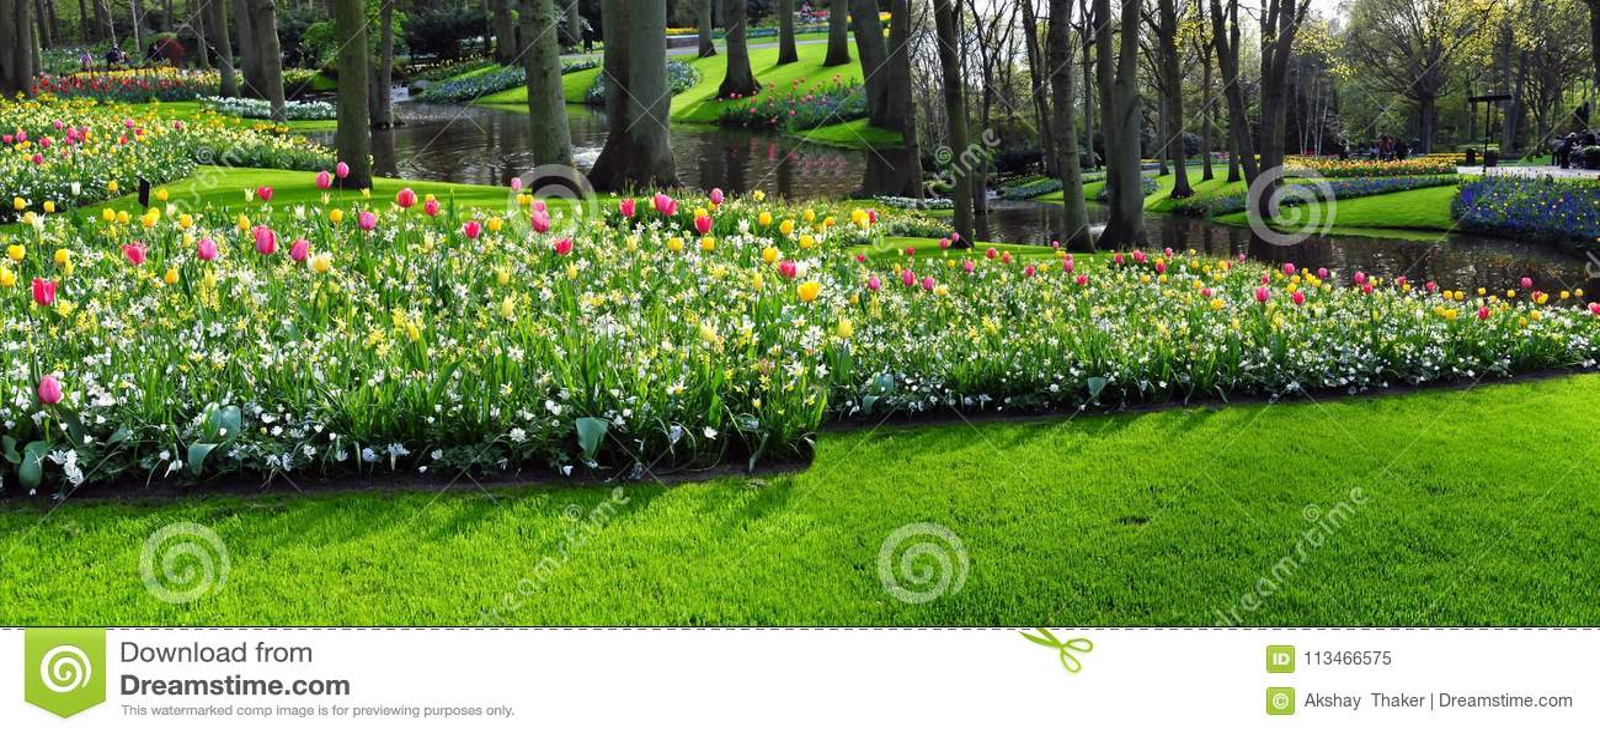 Keukenhof garden known as the garden of europe is one of the world download keukenhof garden known as the garden of europe is one of the world izmirmasajfo